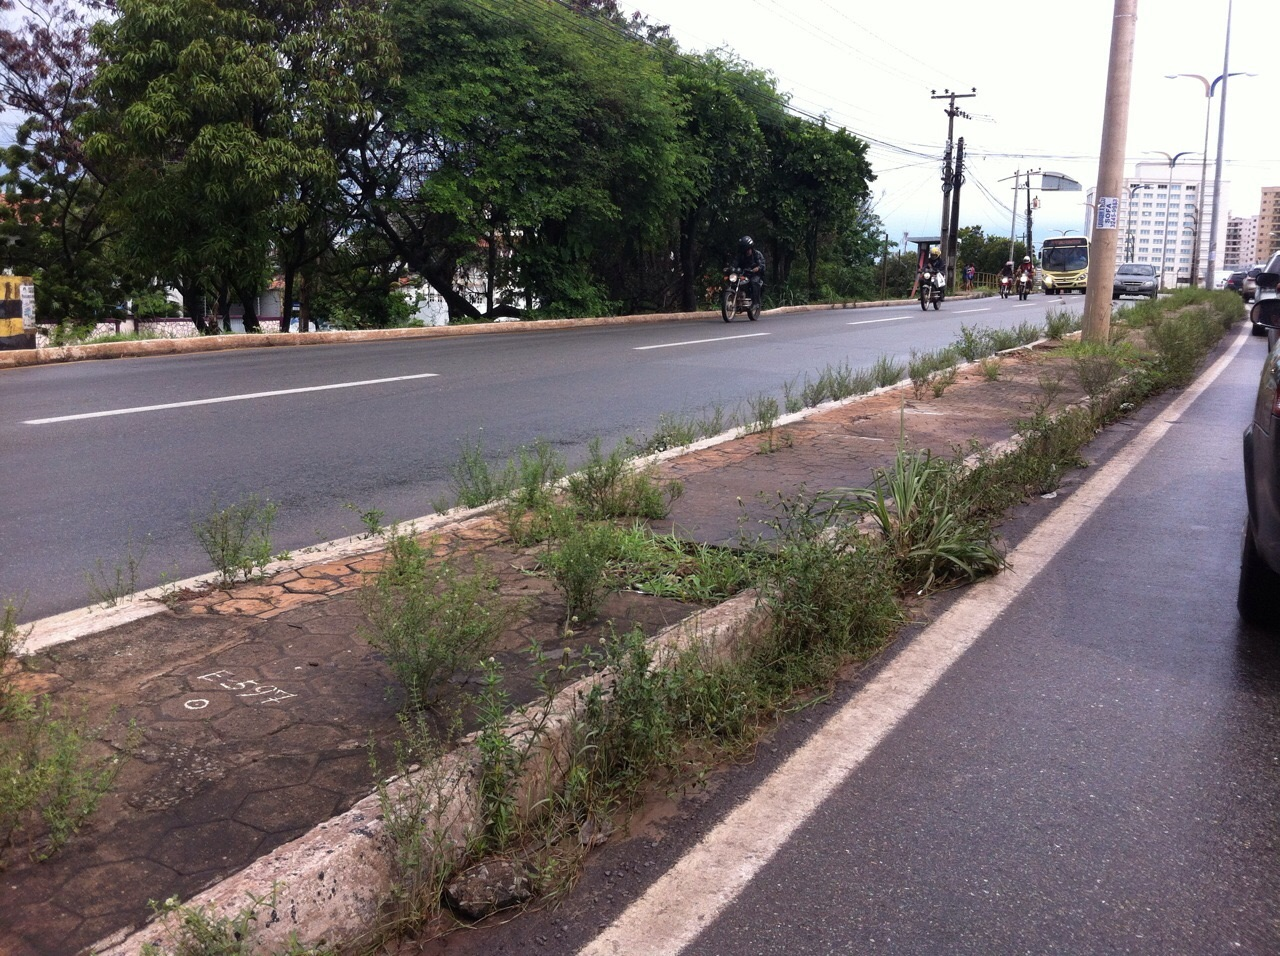 Avenida próximo do bairro Cohafuma. (Foto: Hilton Franco)